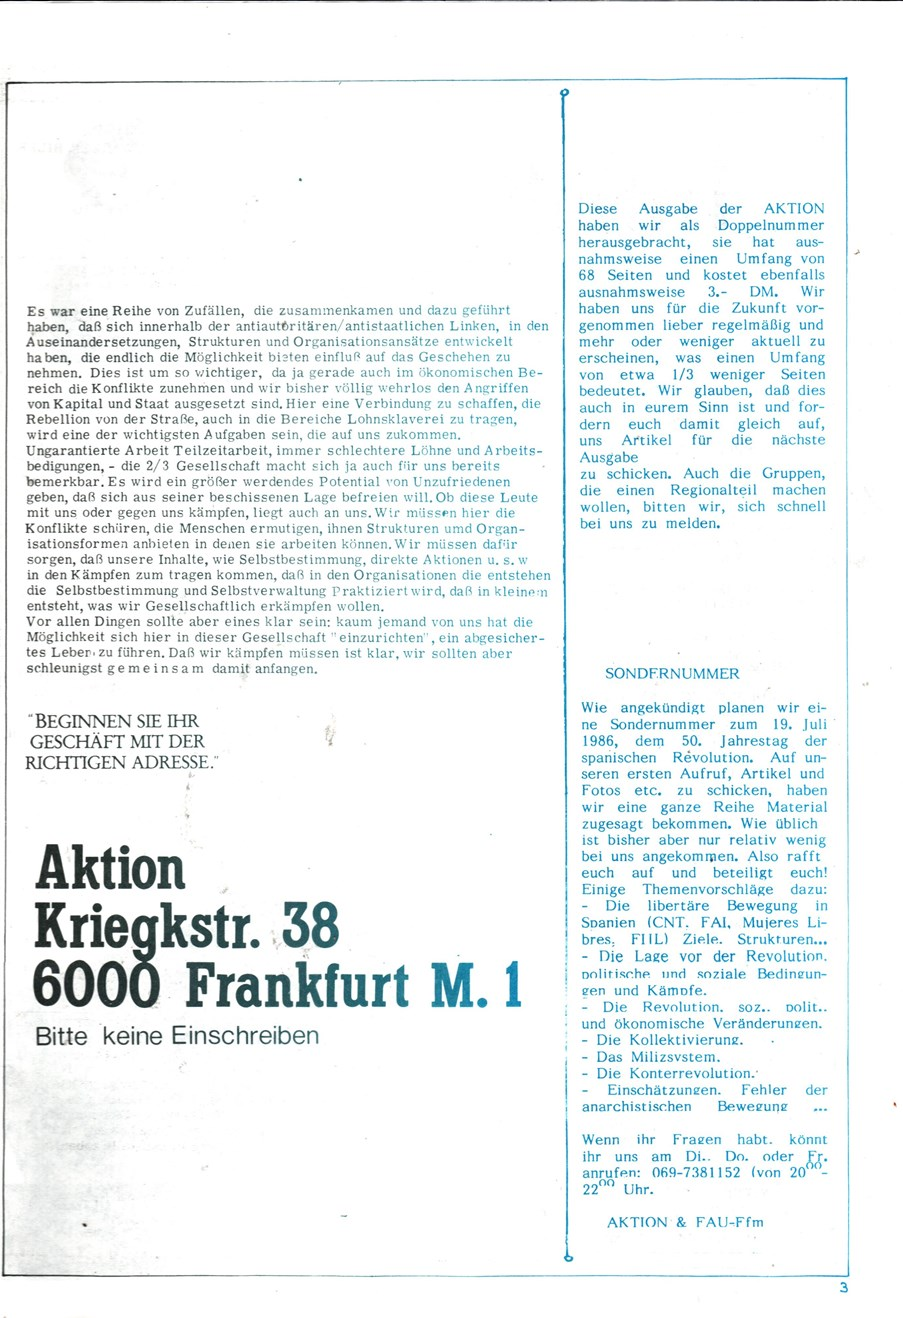 Frankfurt_Aktion_19860100_001_003